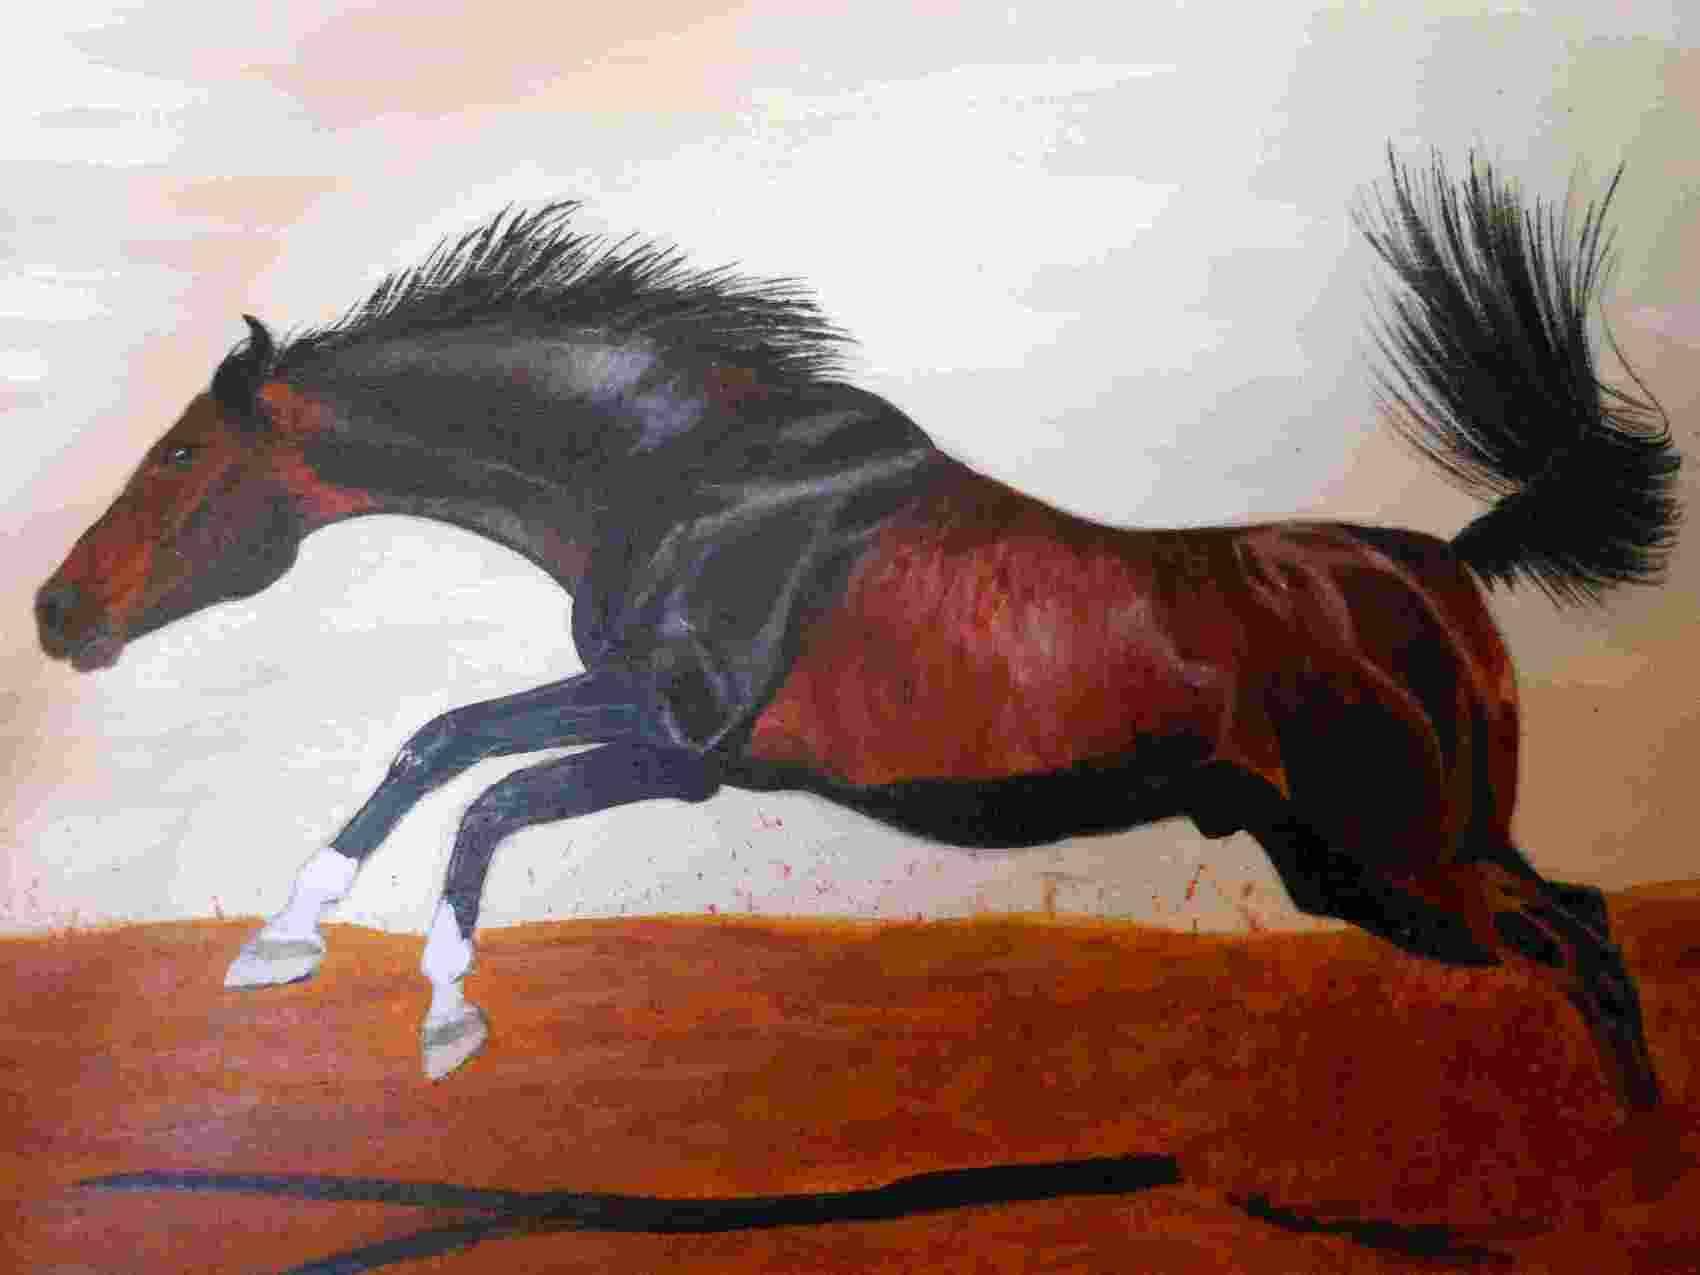 cheval baie brûlé au galop